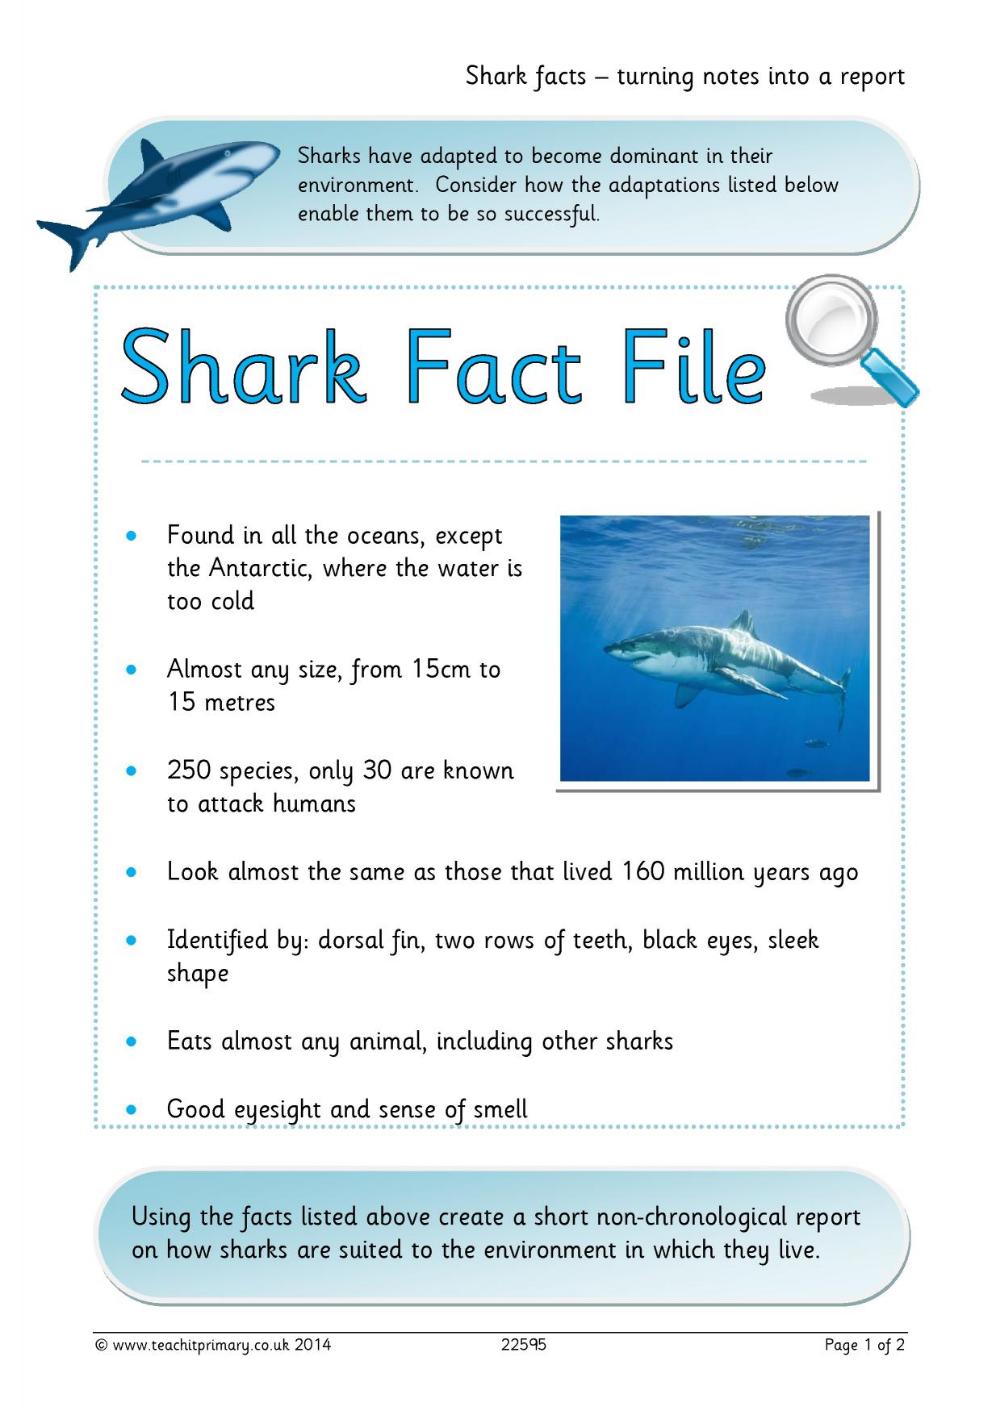 Shark Themed Unit Pdf Google Search Shark Facts Shark Facts [ 1415 x 1000 Pixel ]